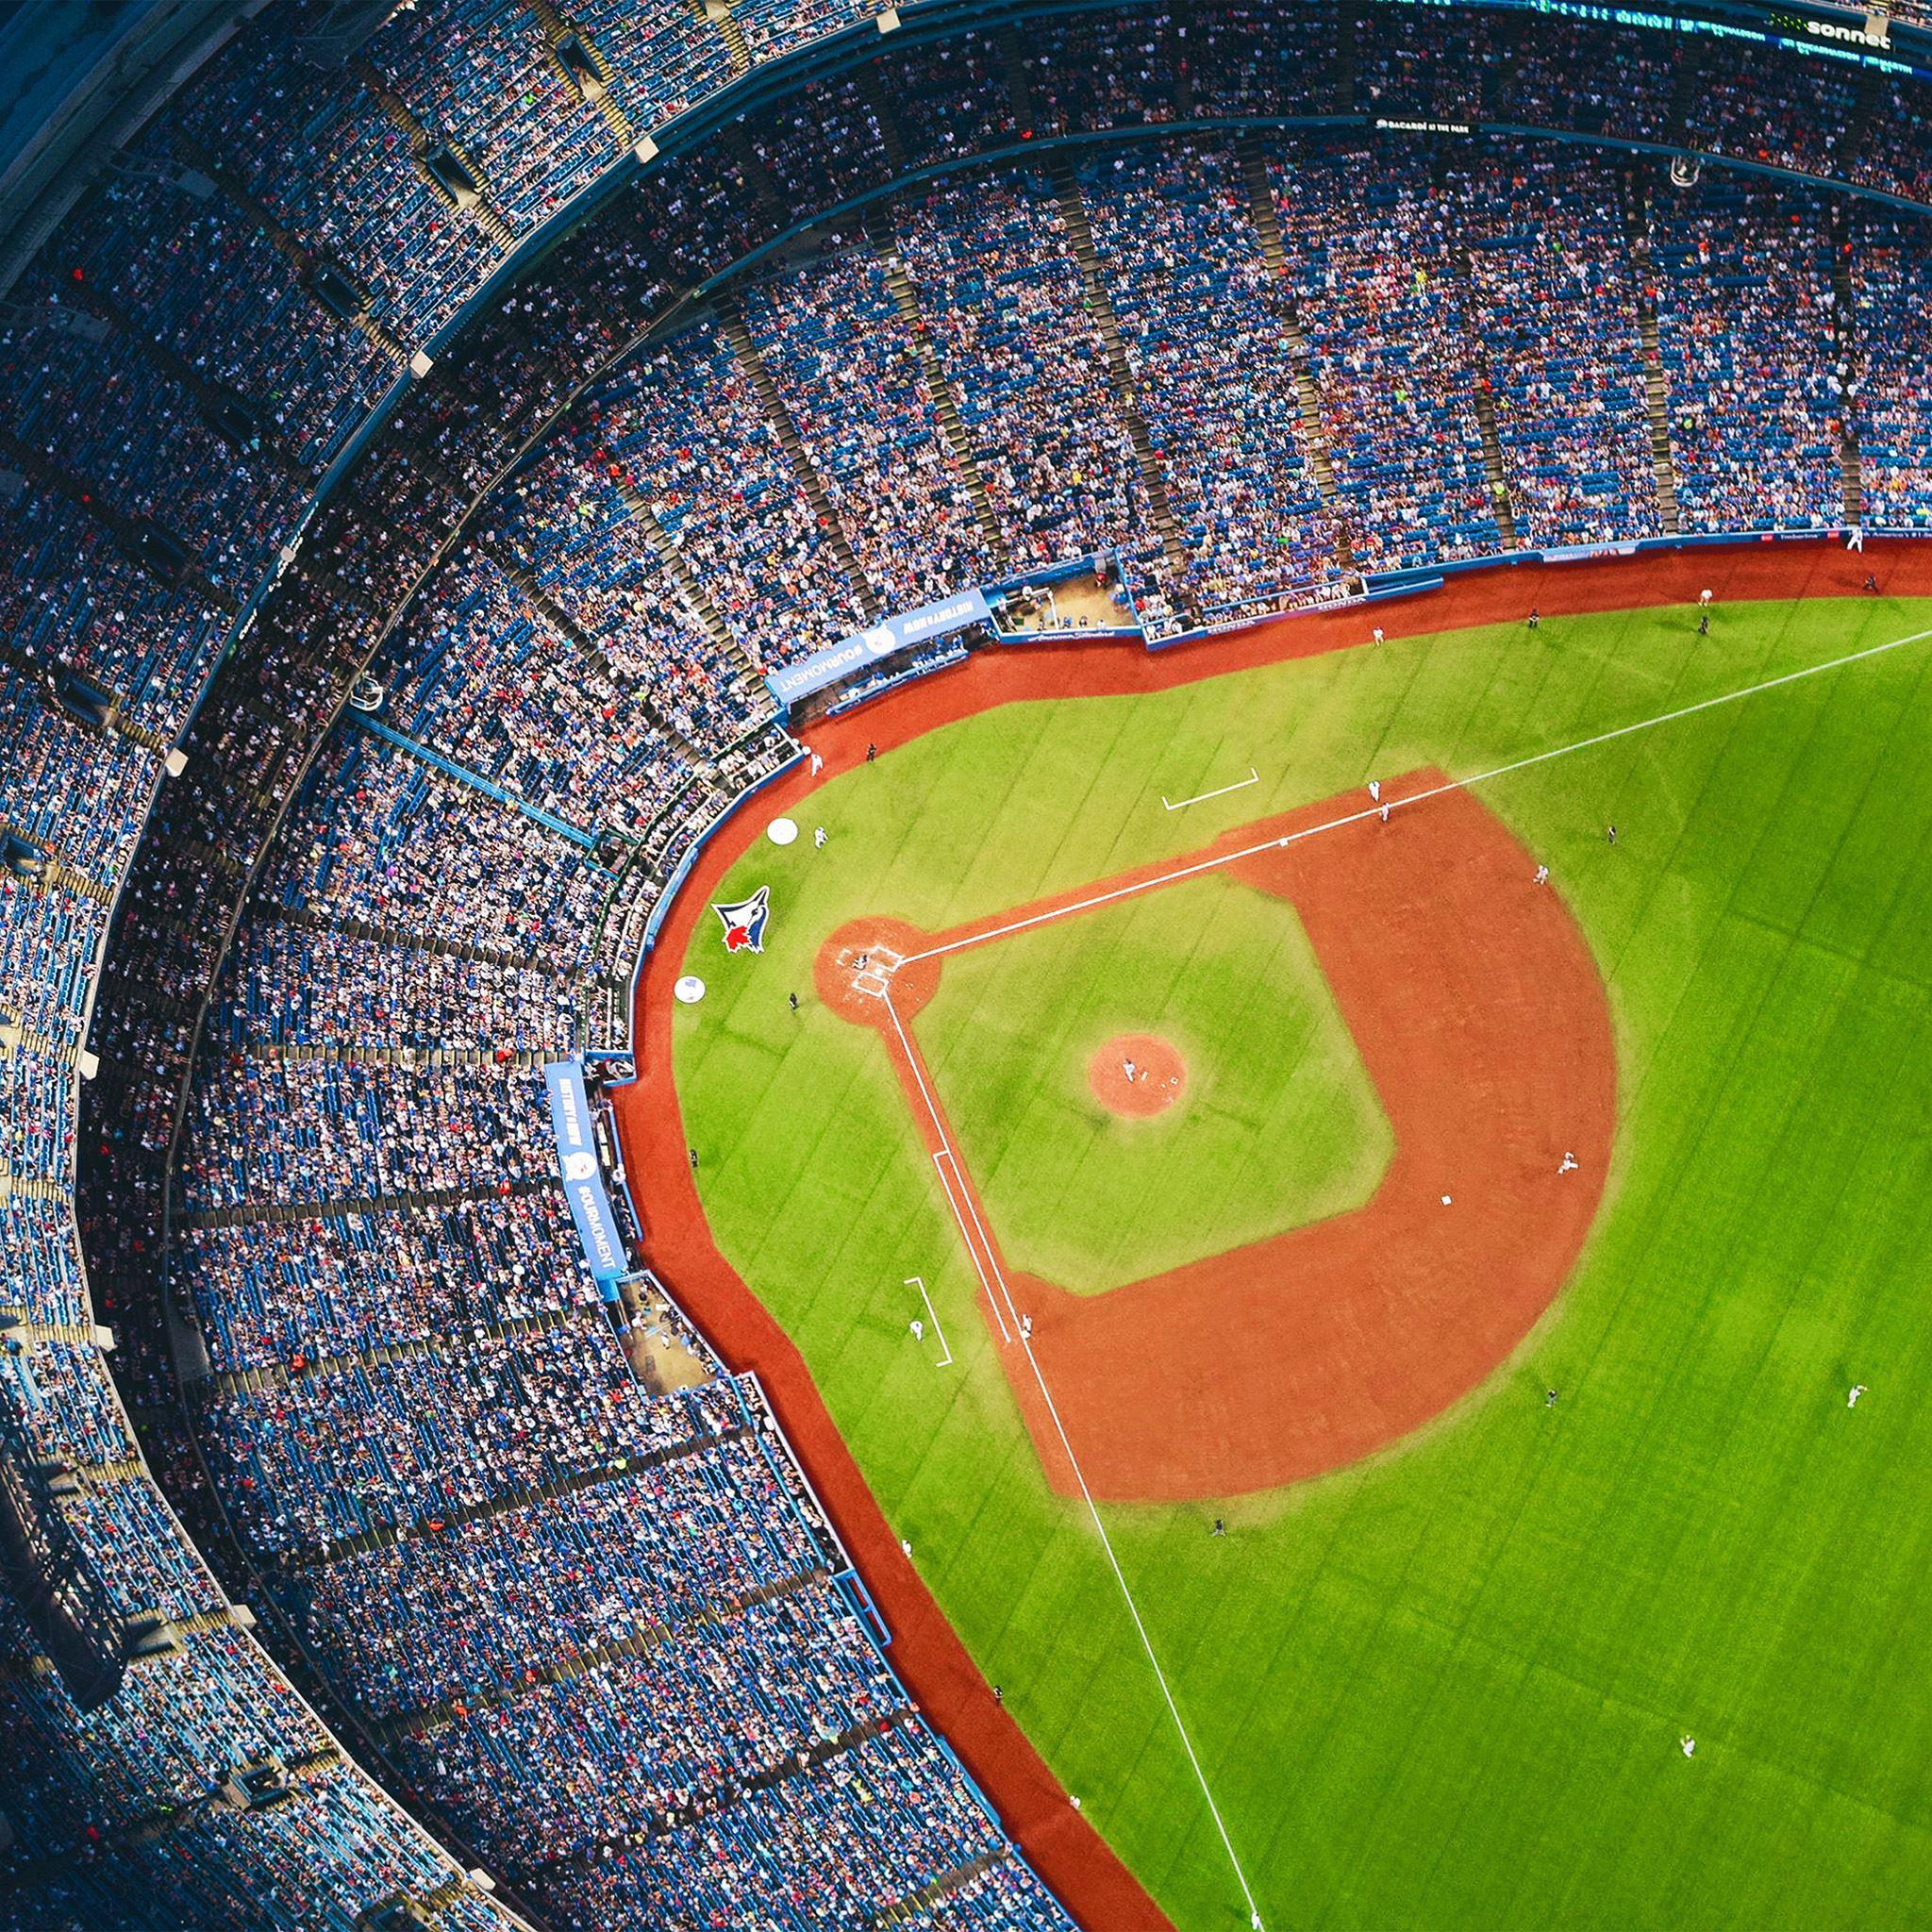 Bluejays Baseball Mlb Field Sports Ipad Air Wallpapers Free Download